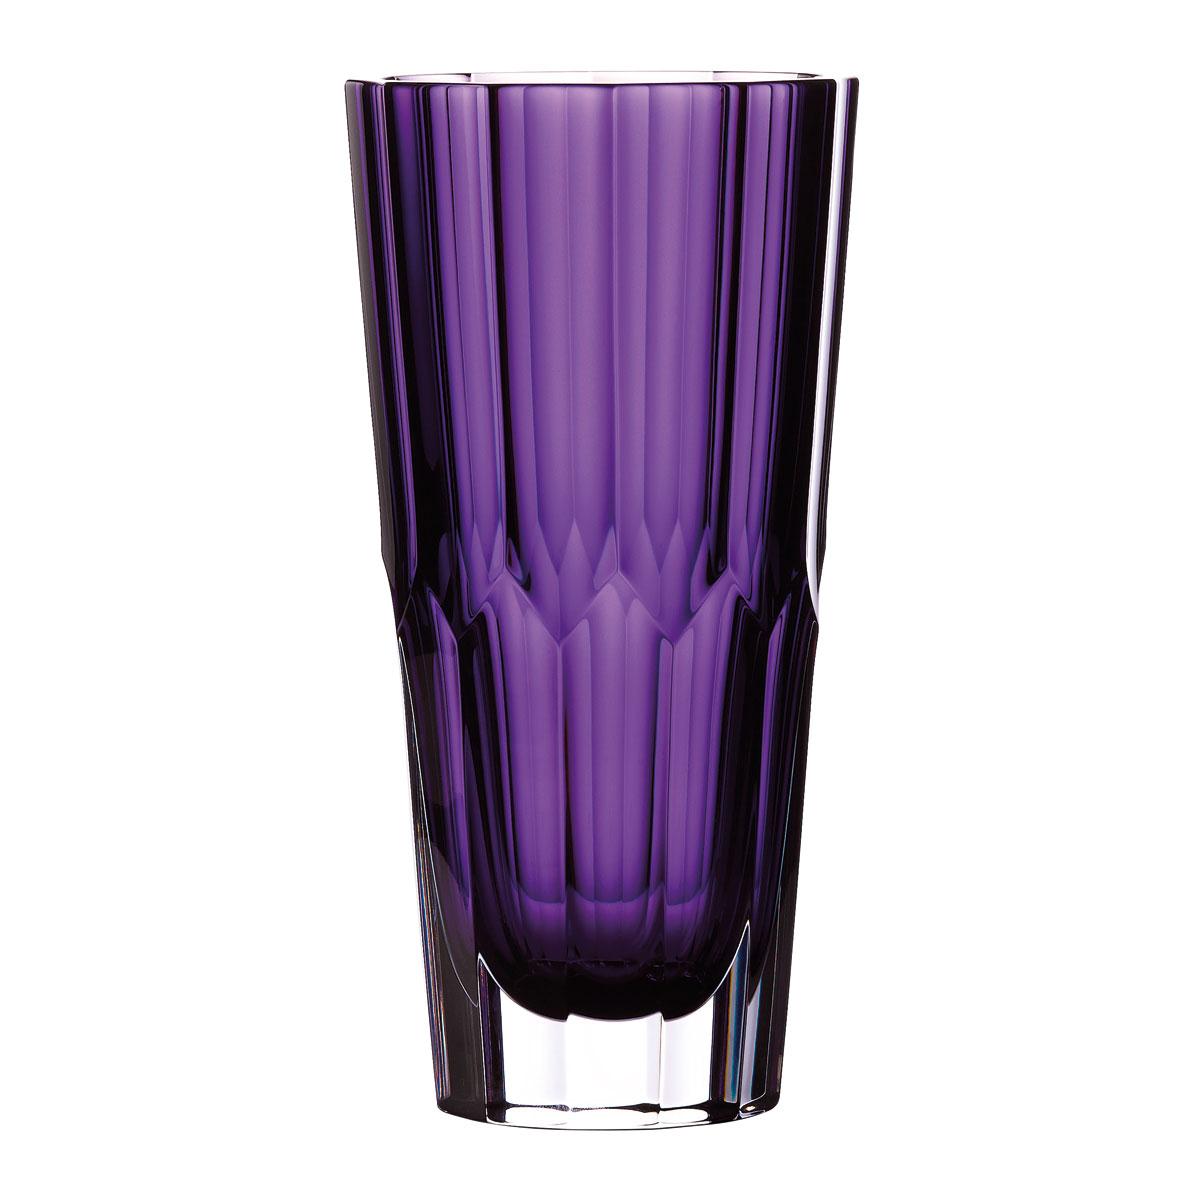 "Waterford Crystal Fleurology Jeff Leatham Icon 10"" Amethyst Vase"